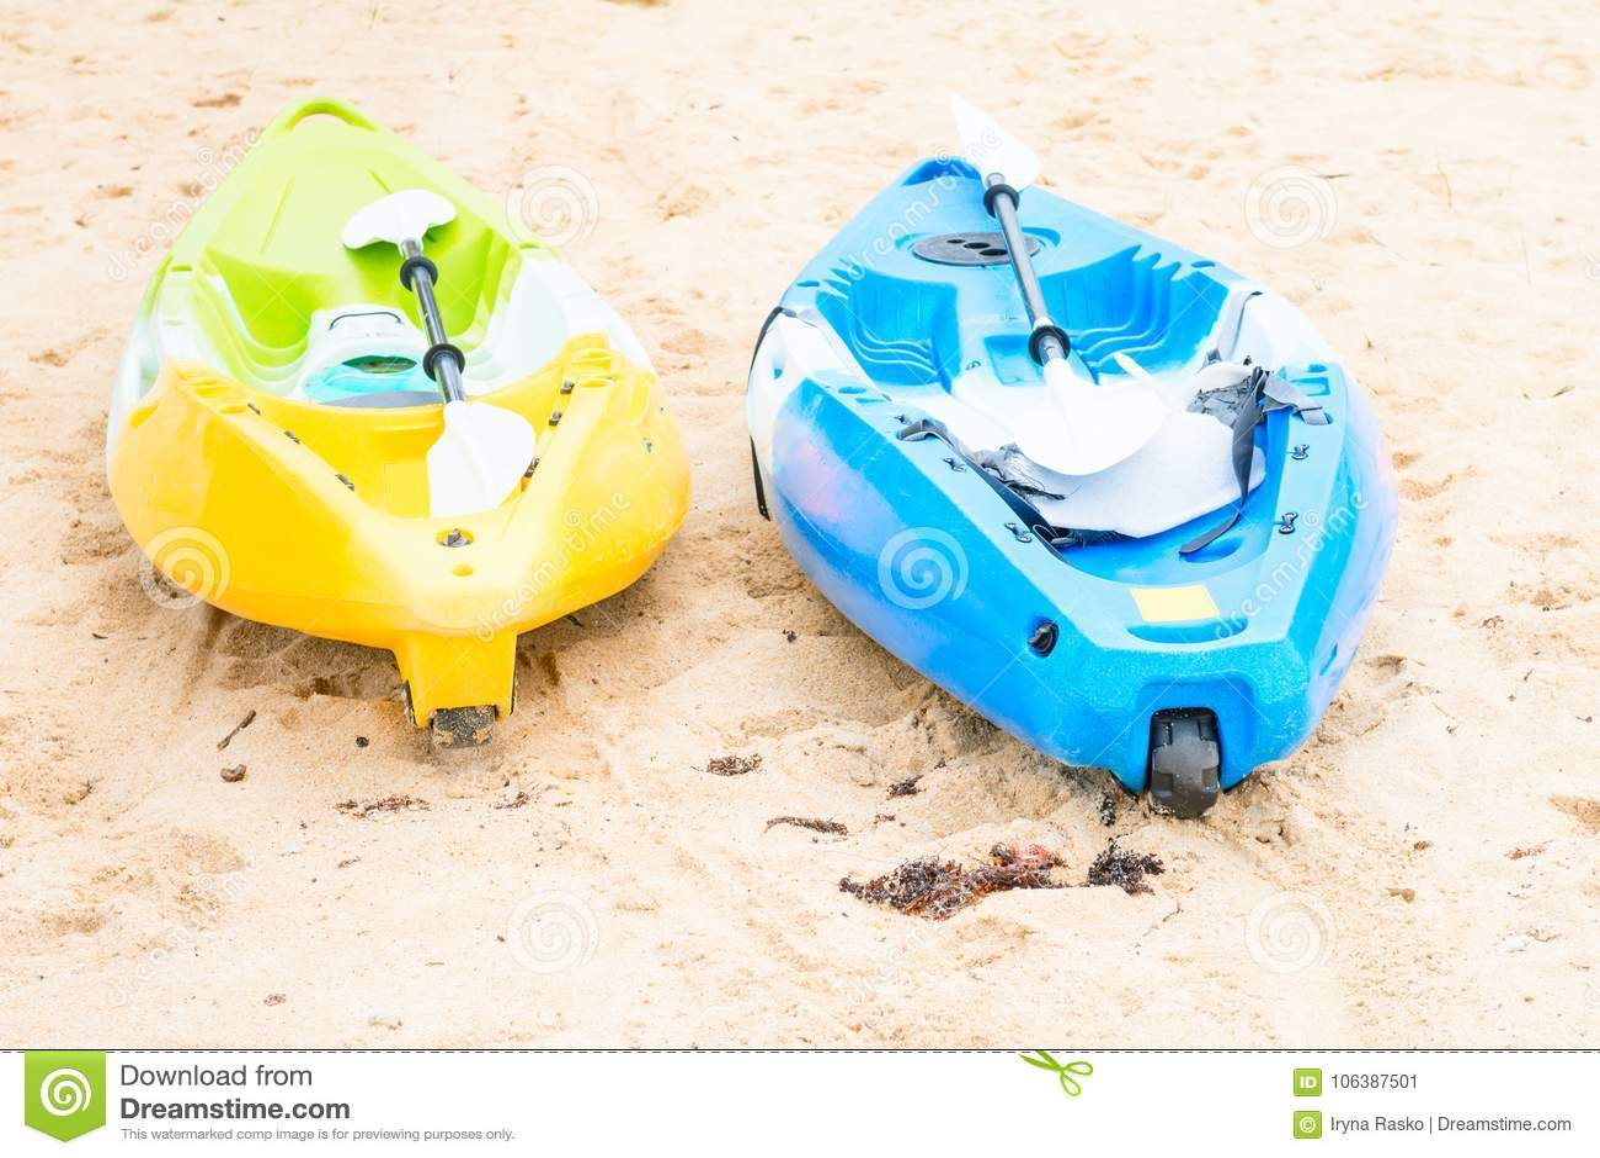 Two bright empty canoe at sand beach